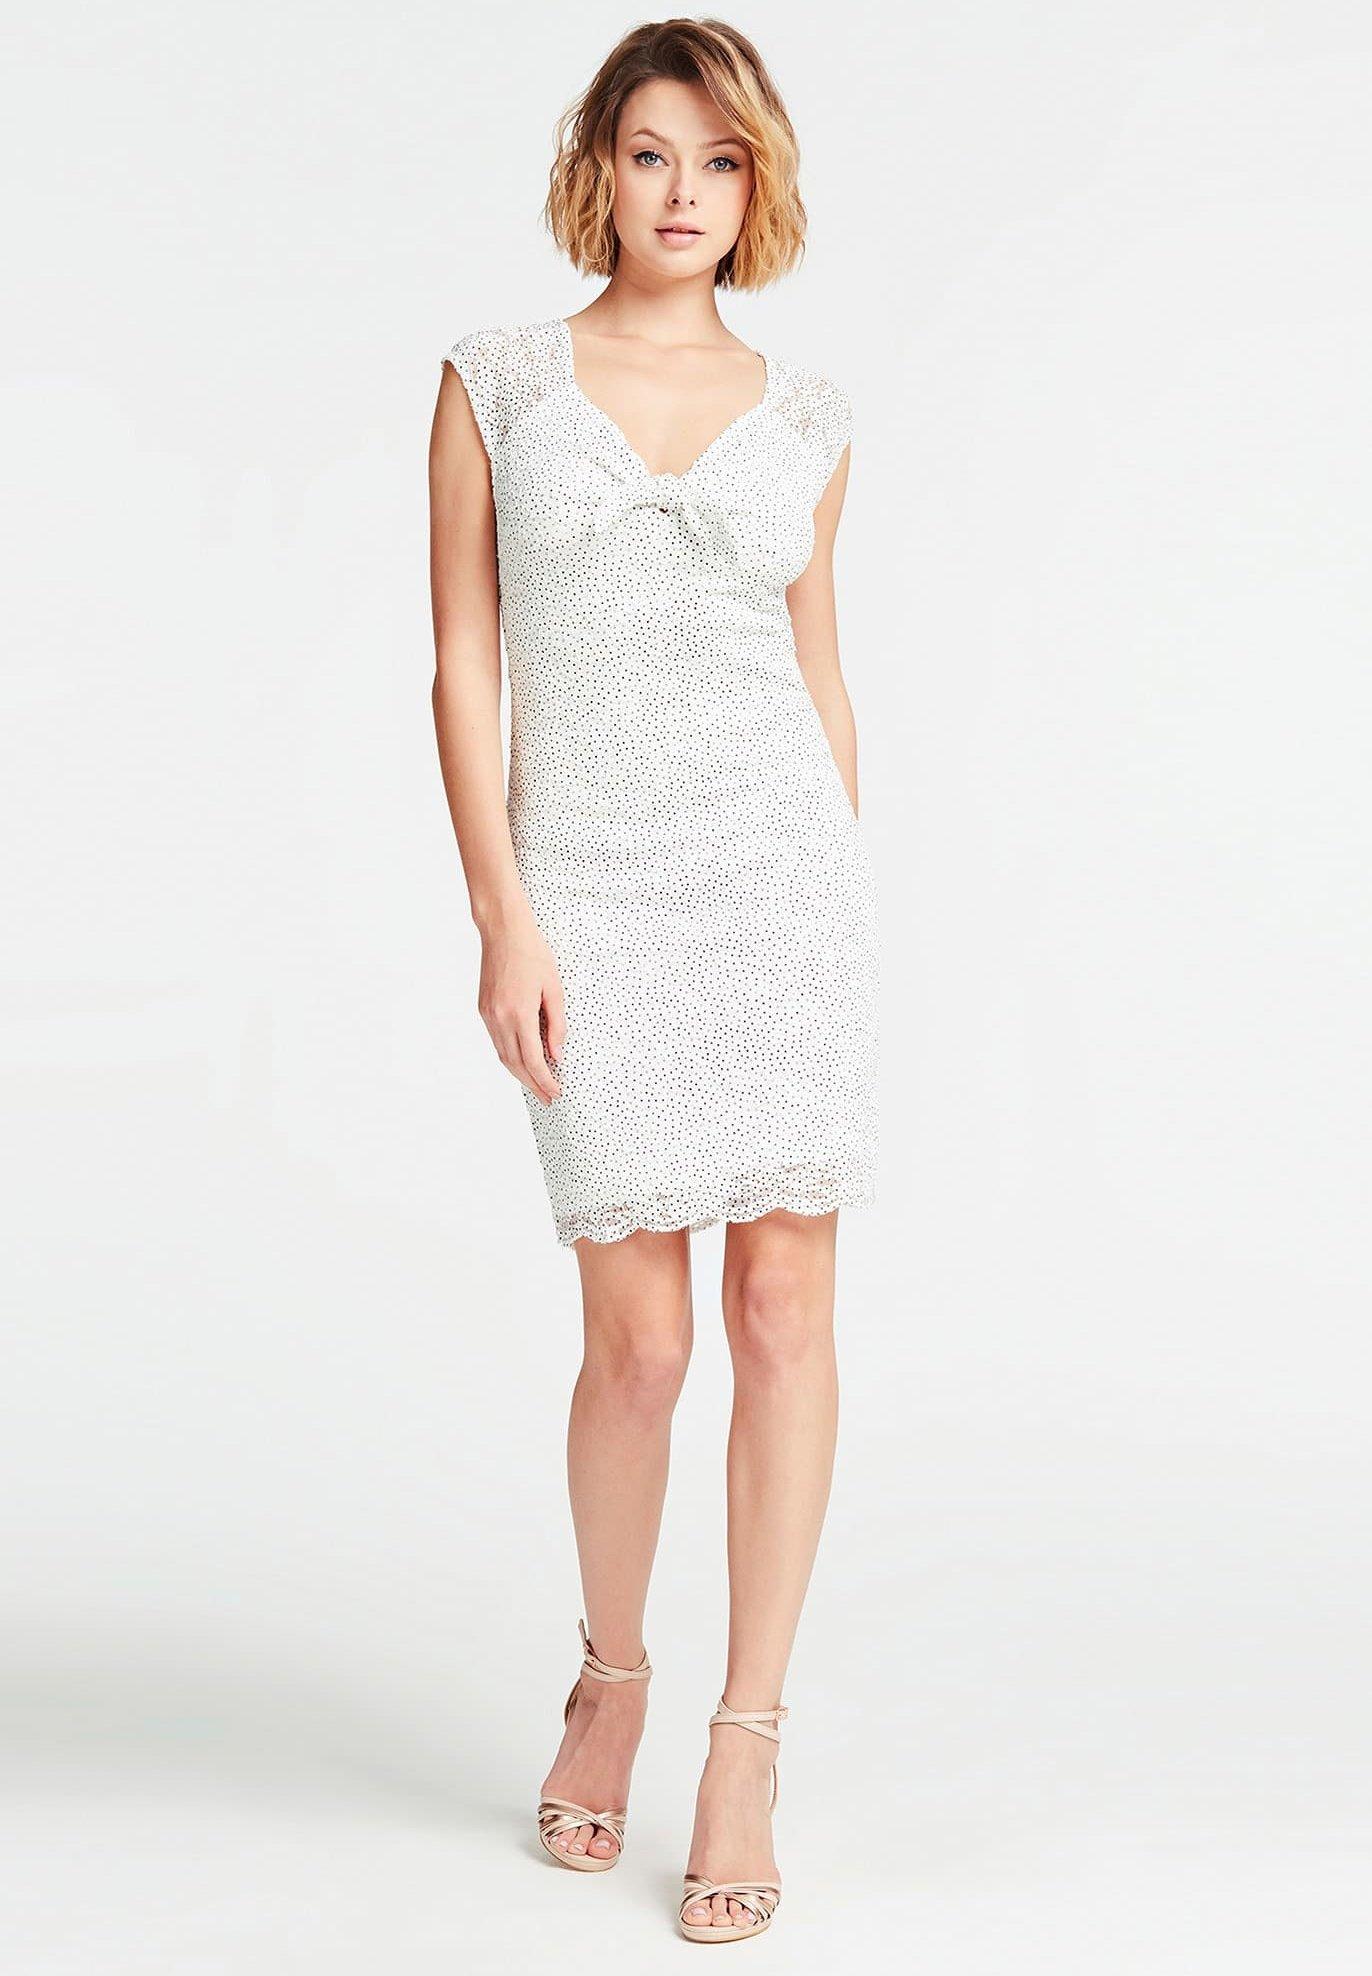 GUESS KLEID MIT PUNKTE-PRINT - Shift dress - weiß